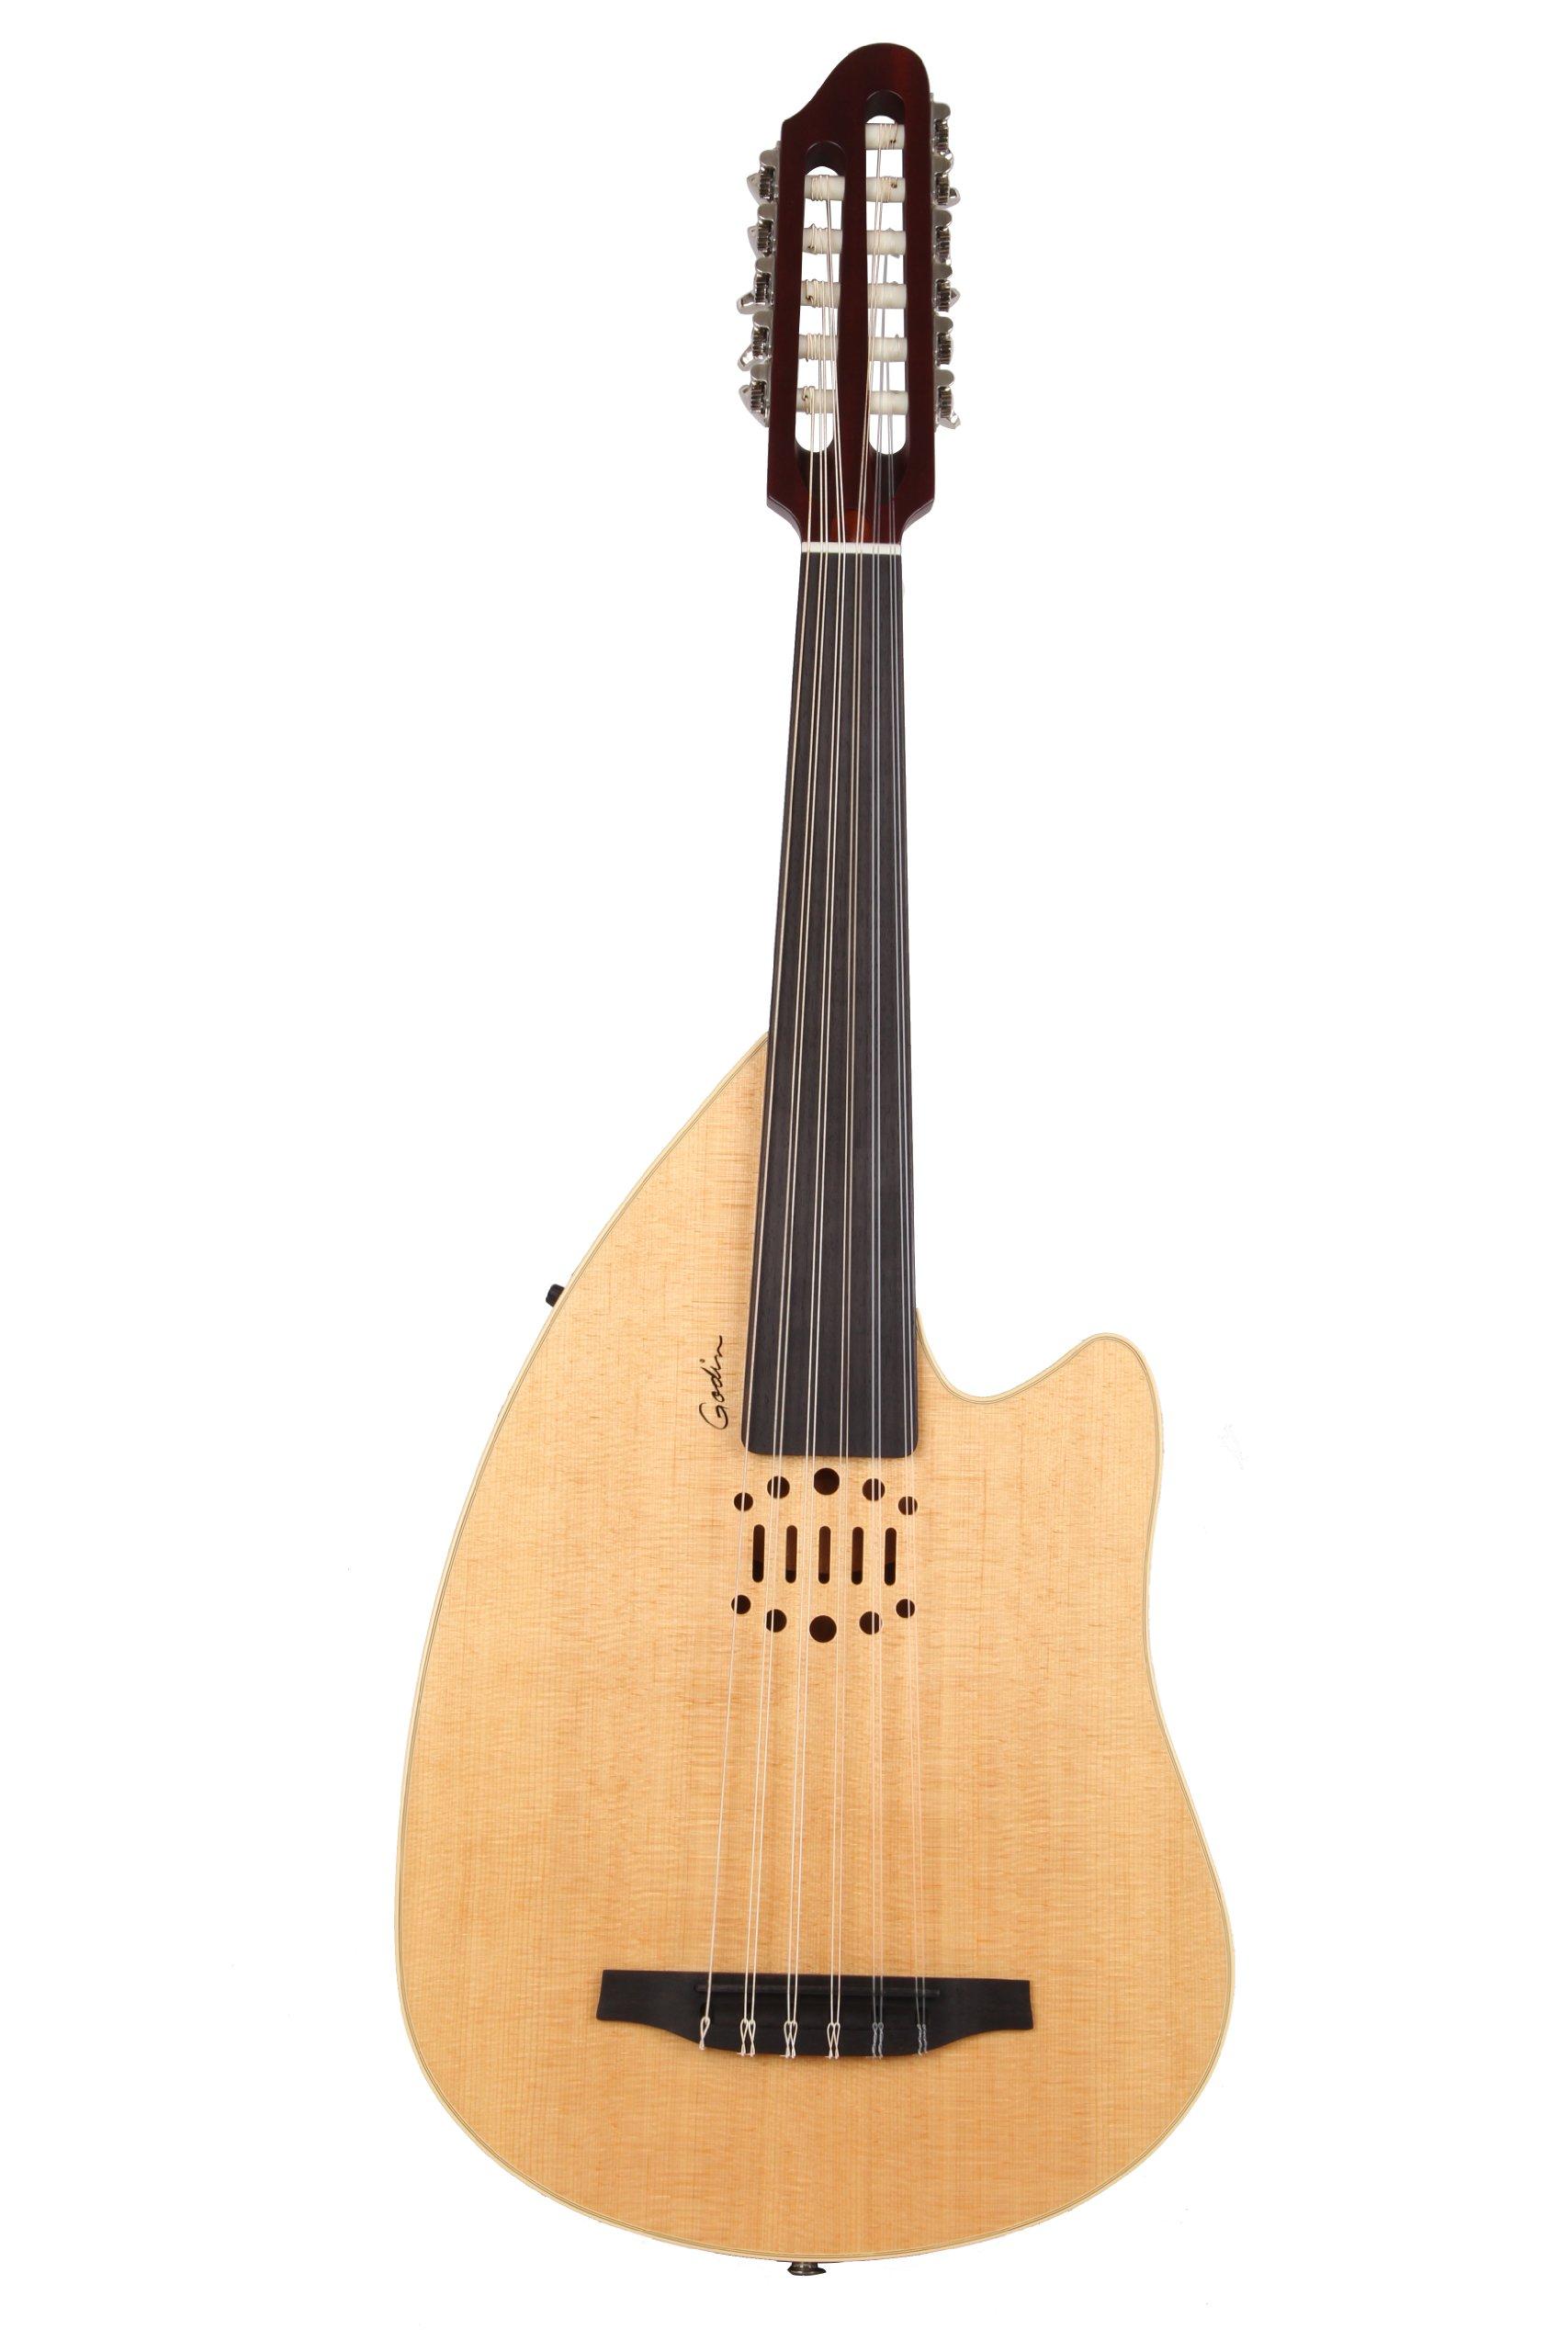 Godin Guitars Multi Oud Series 035014 10-Strings Hollow-Body Electric Guitar, Natural HG